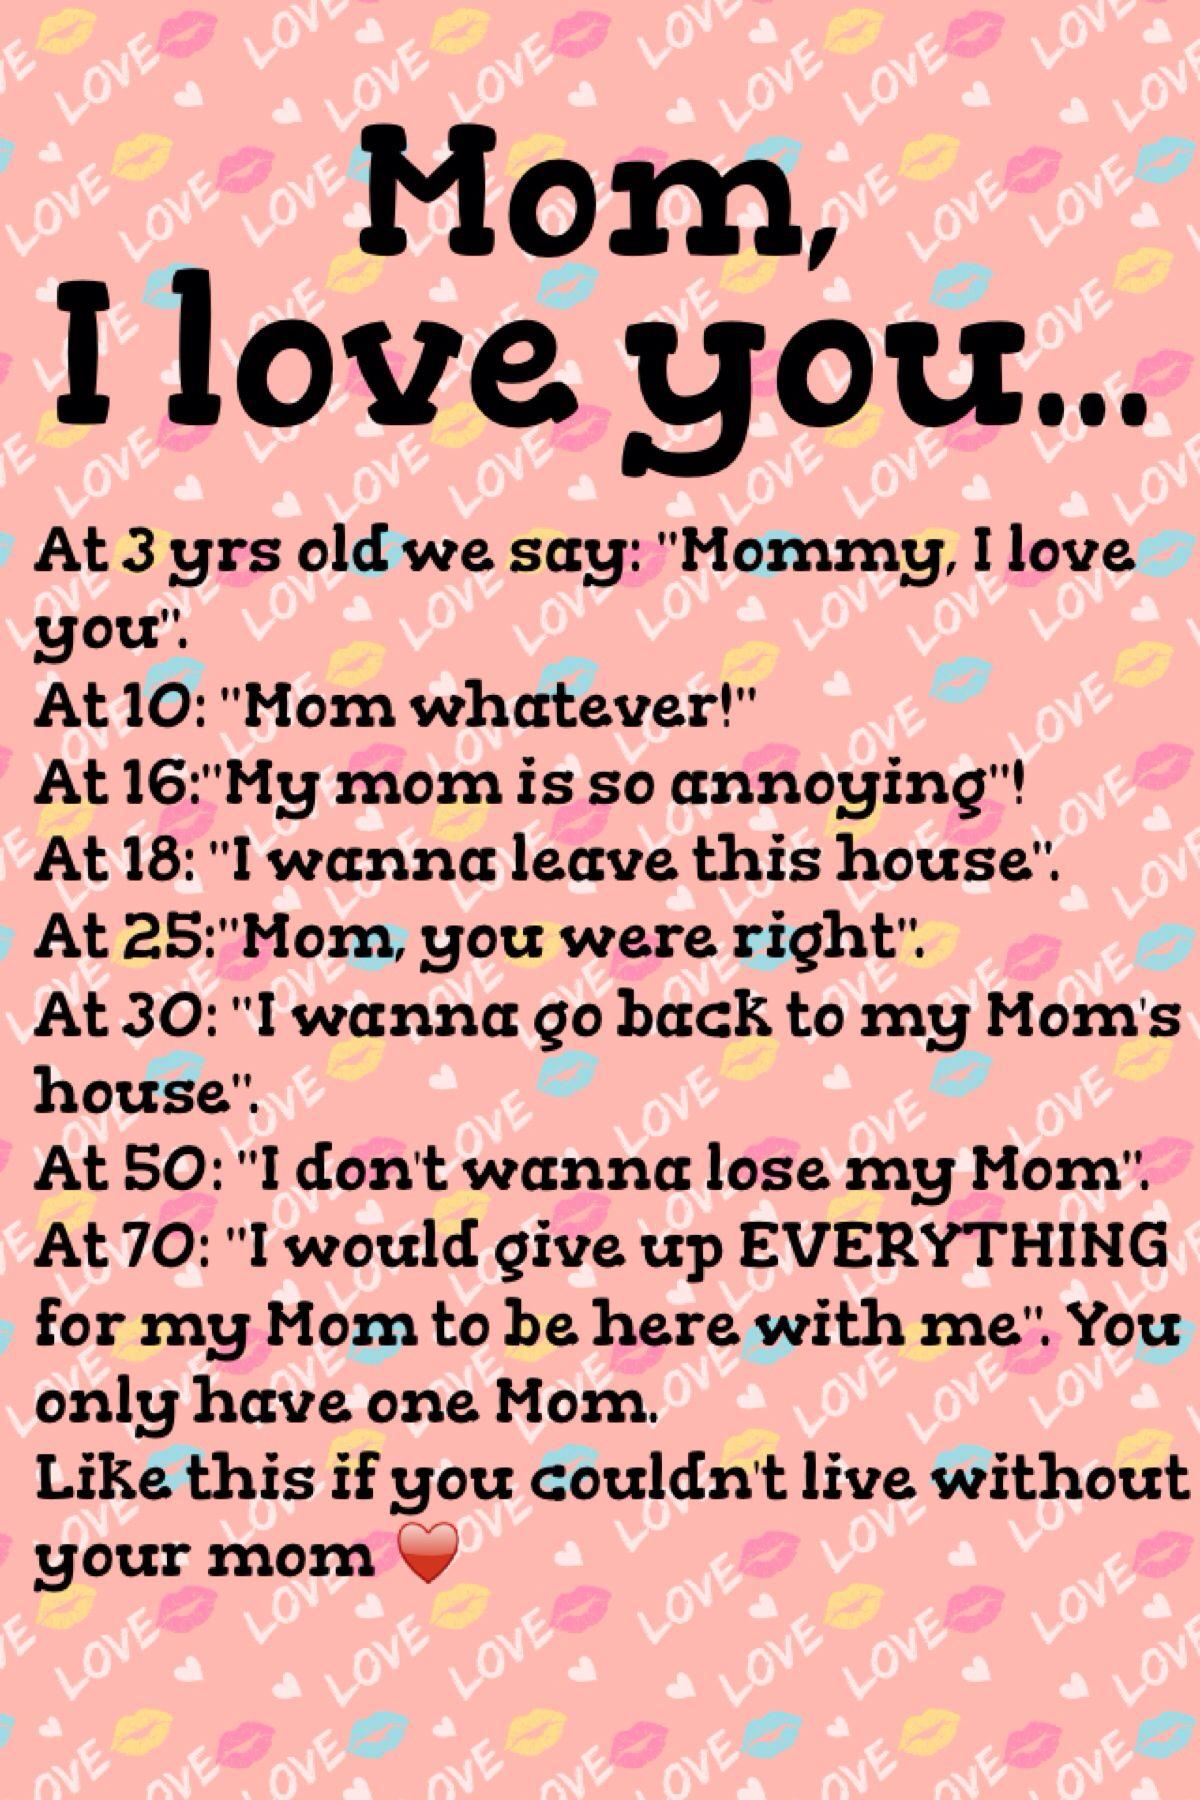 d7bdb40eb84a5708f44e6f0aca7d1c7f - How To Get Out Of Your Mom S House